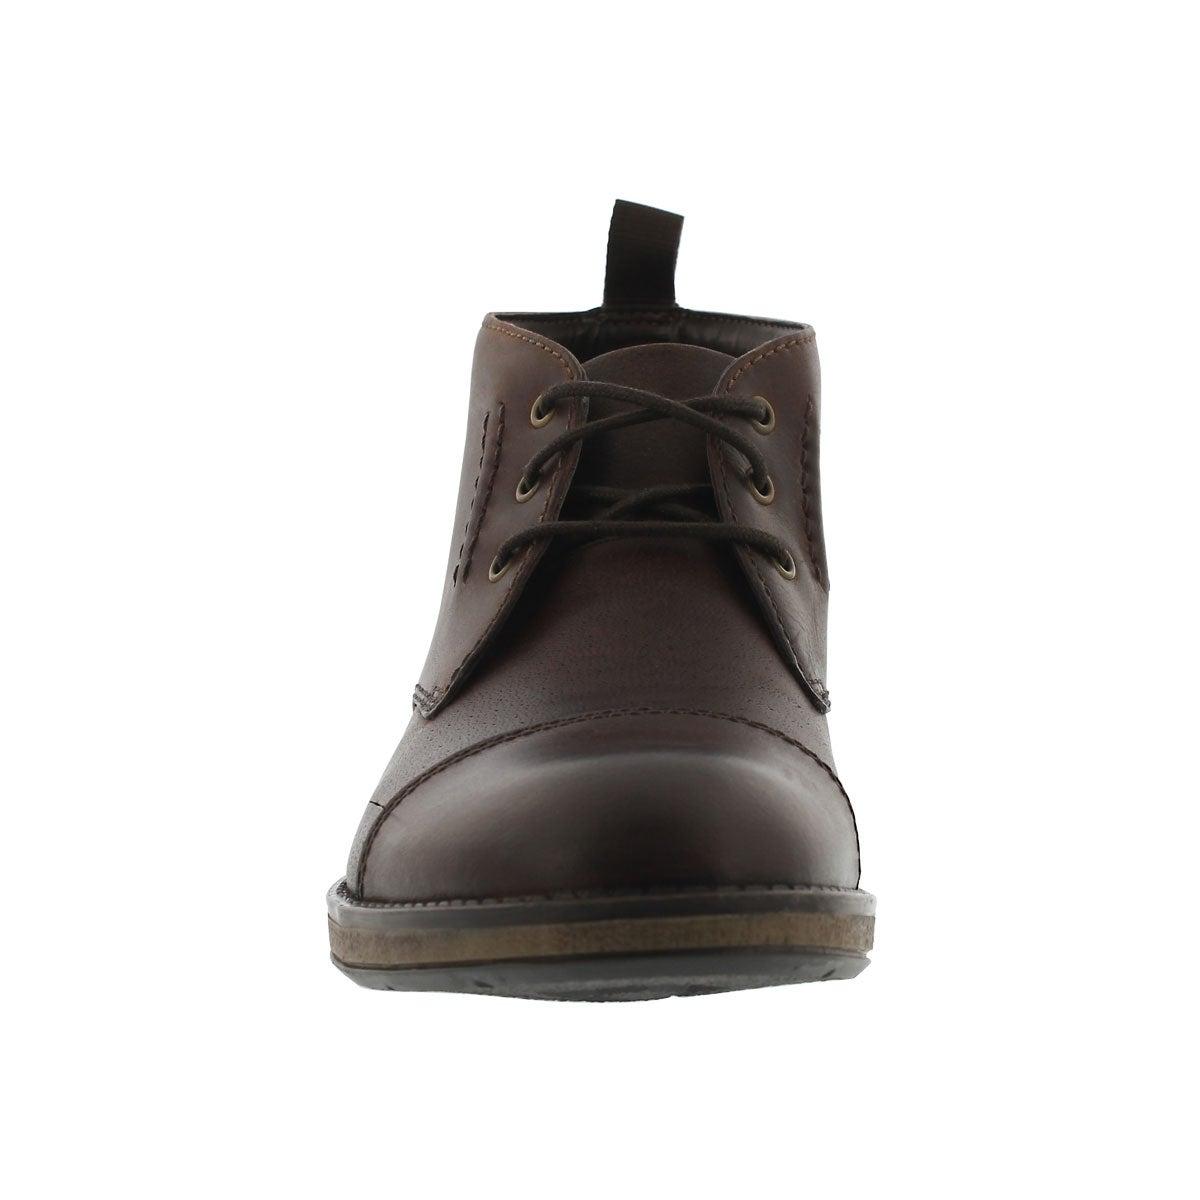 Mns Hinman Mid mahogany chukka boot